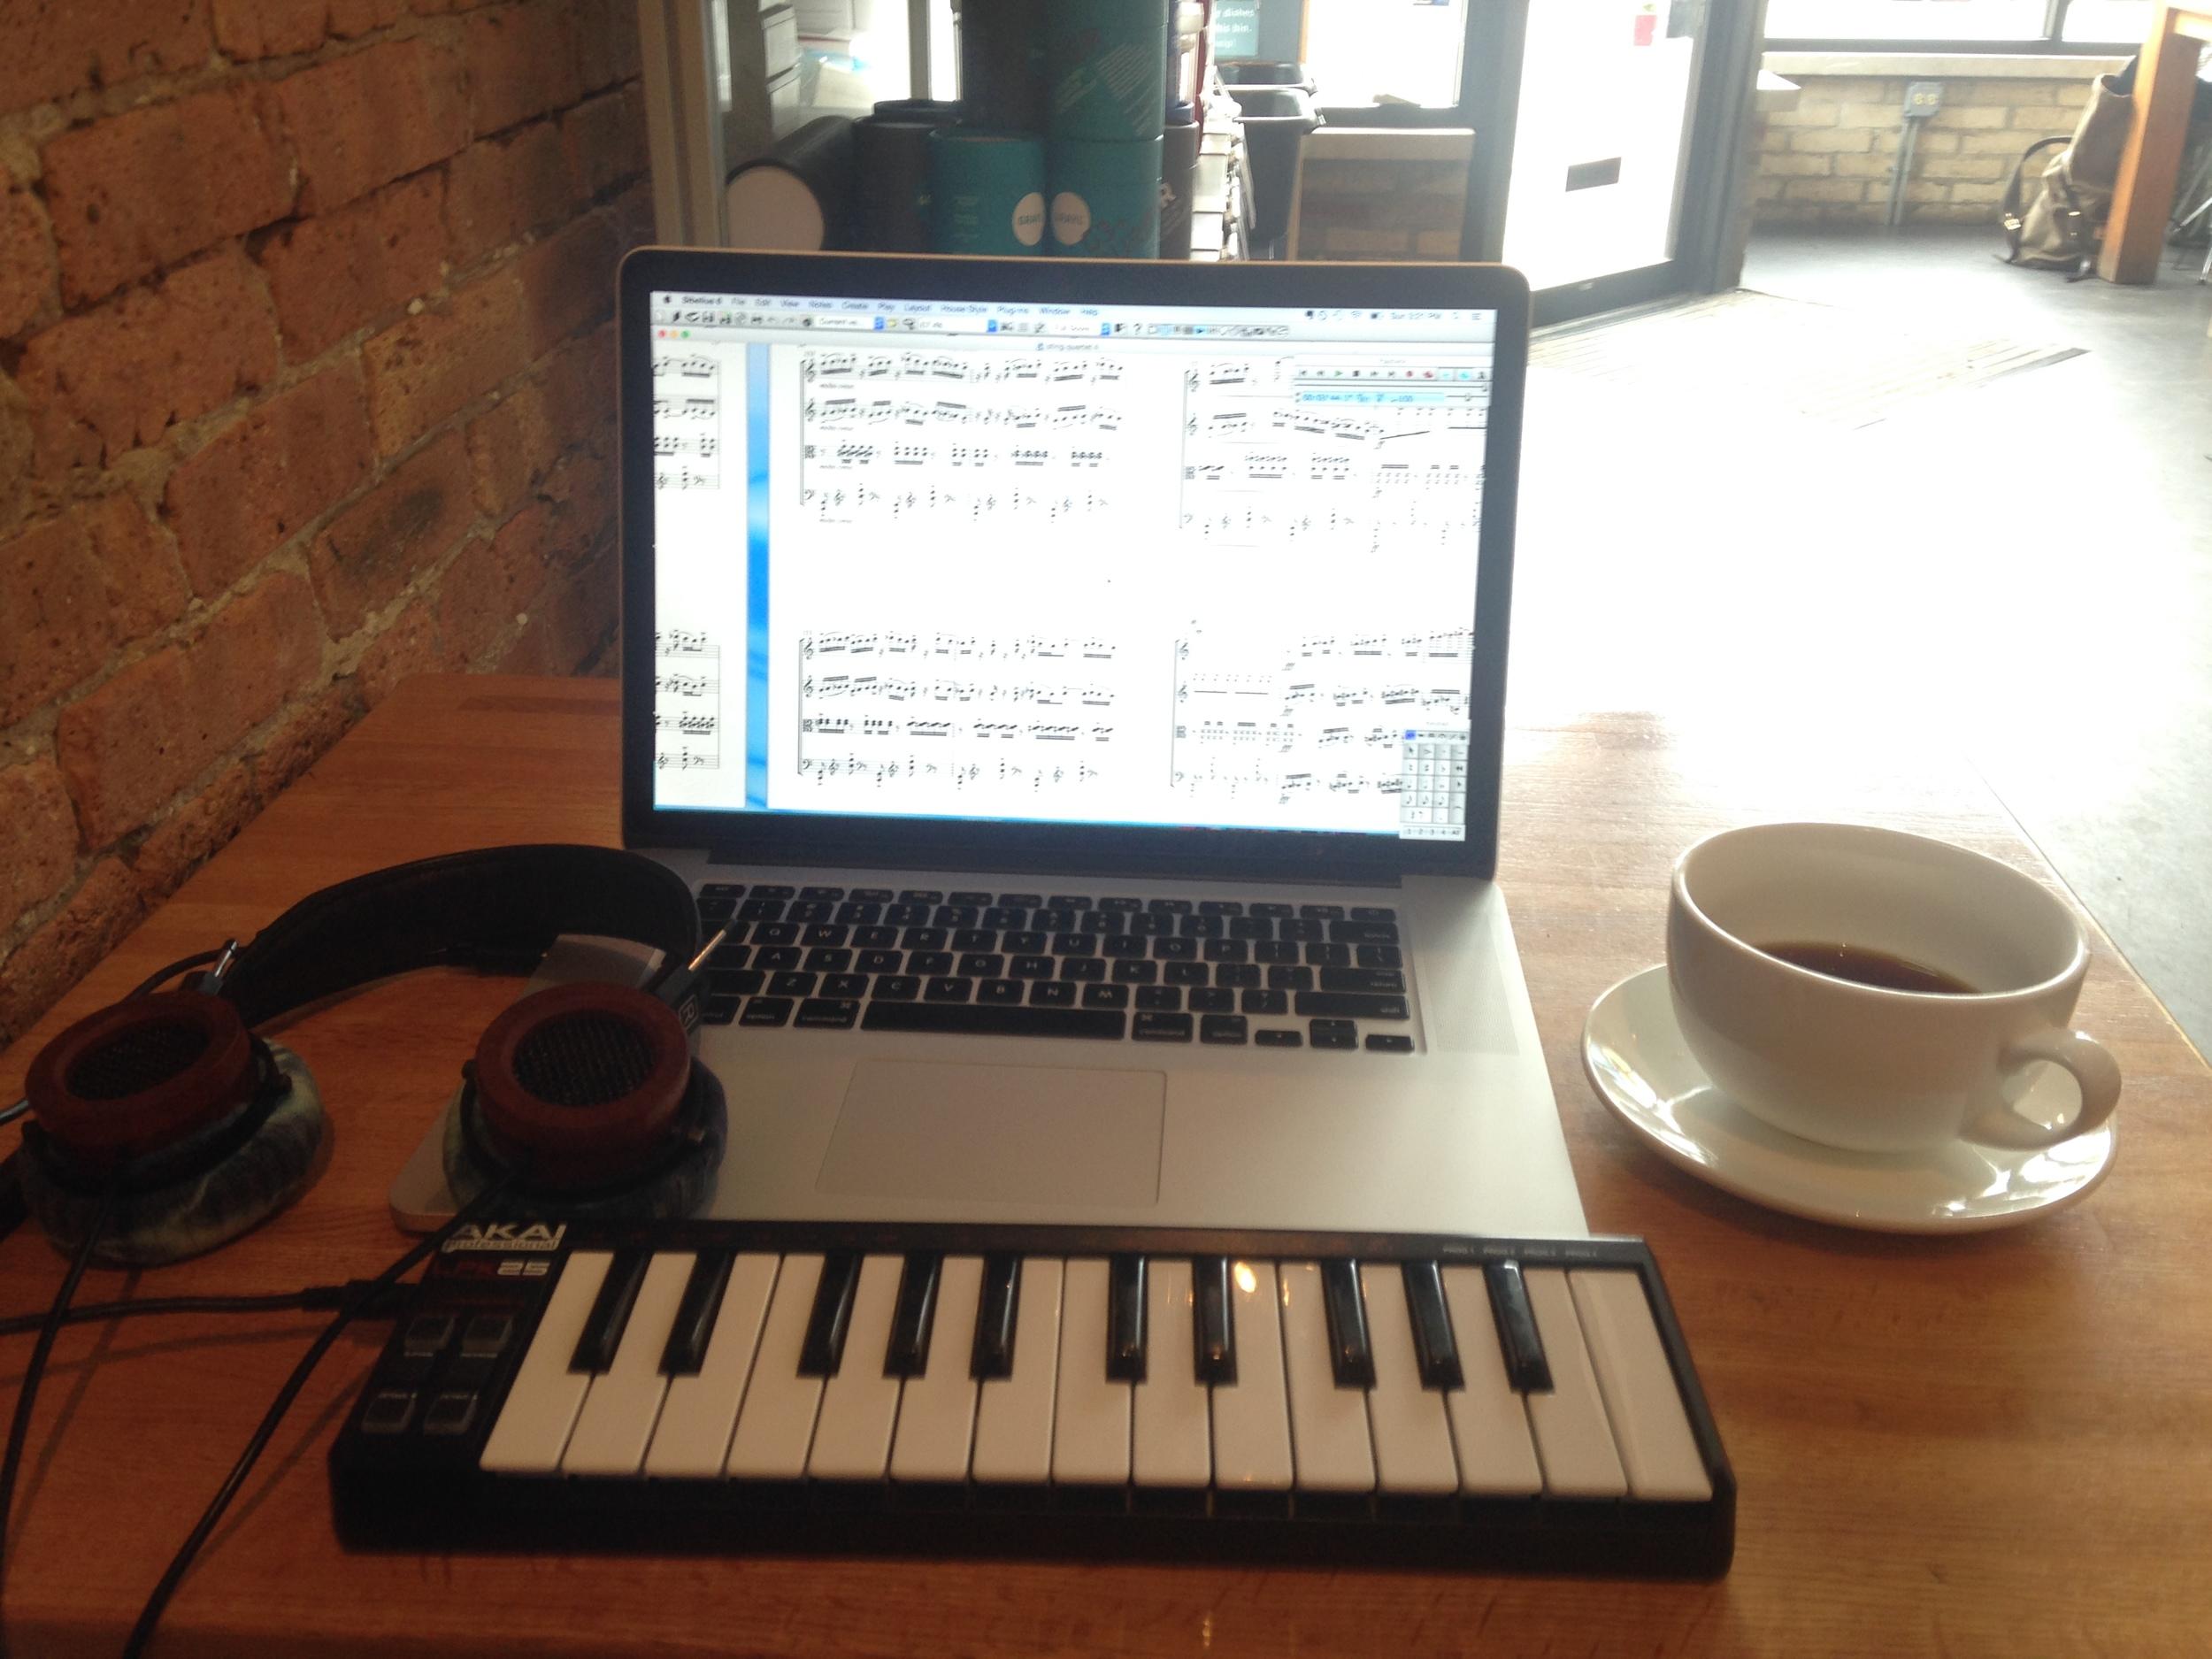 Coffeeshop setup